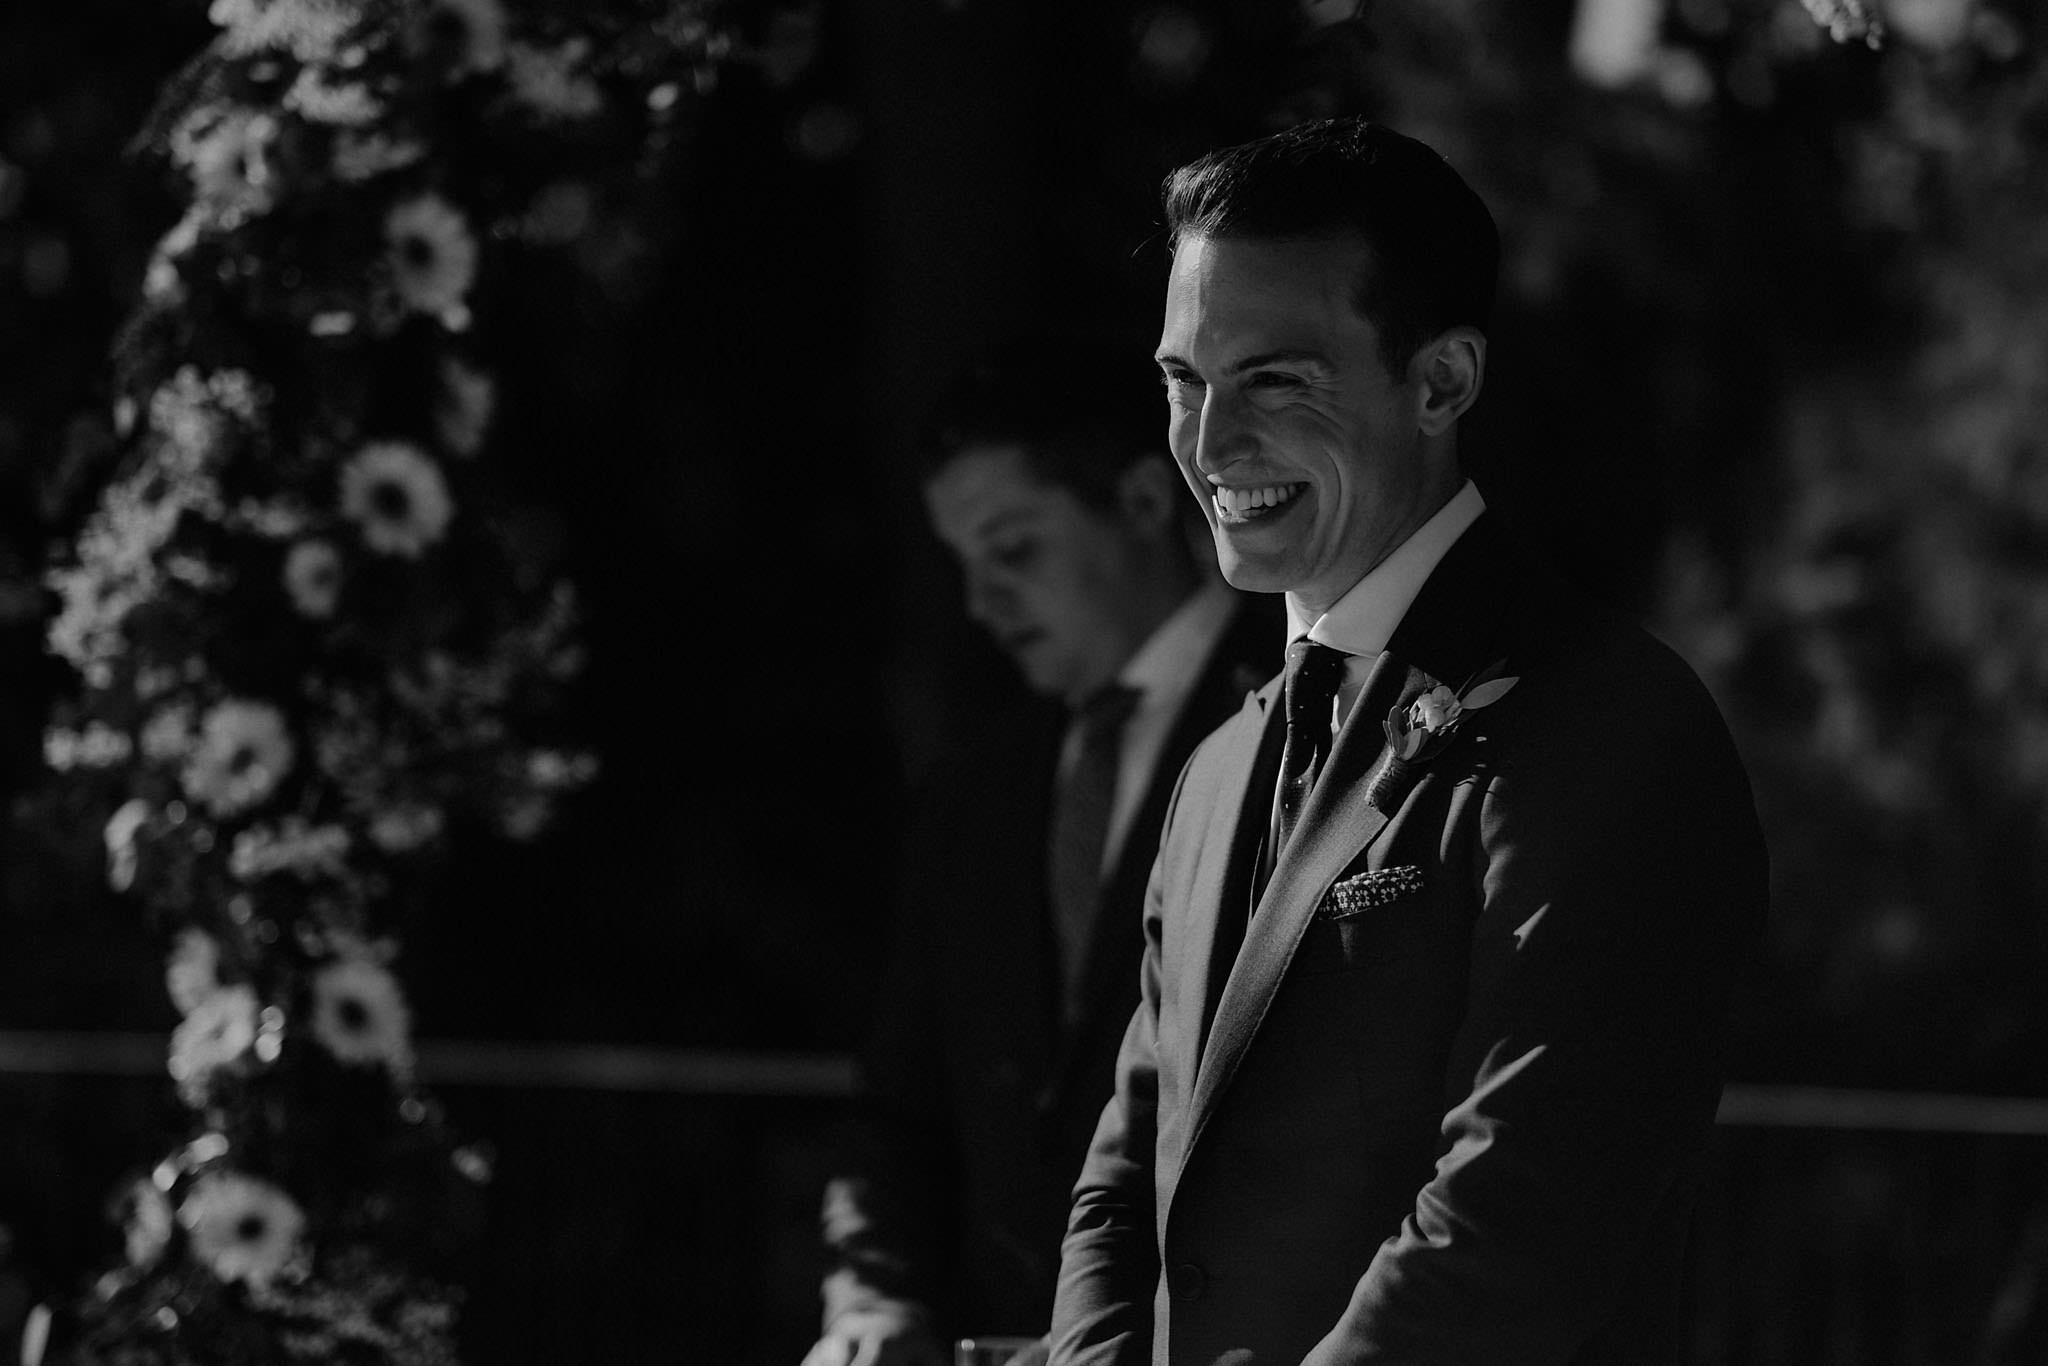 Max-Steph-Italy-Wedding-351.jpg